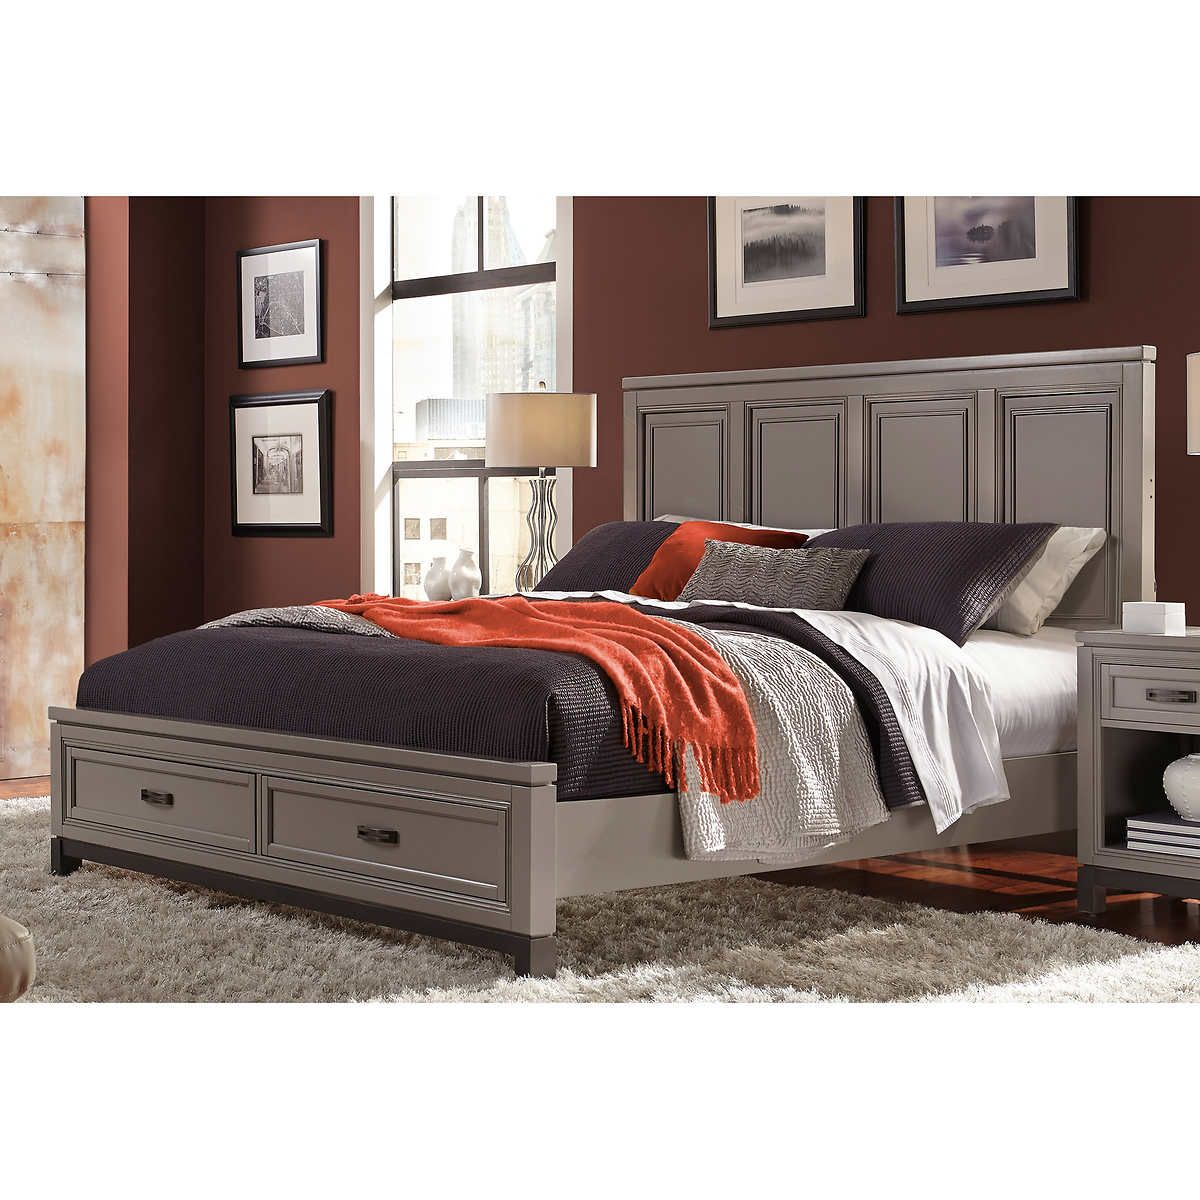 Norah King Storage Bed King storage bed, Master bedroom